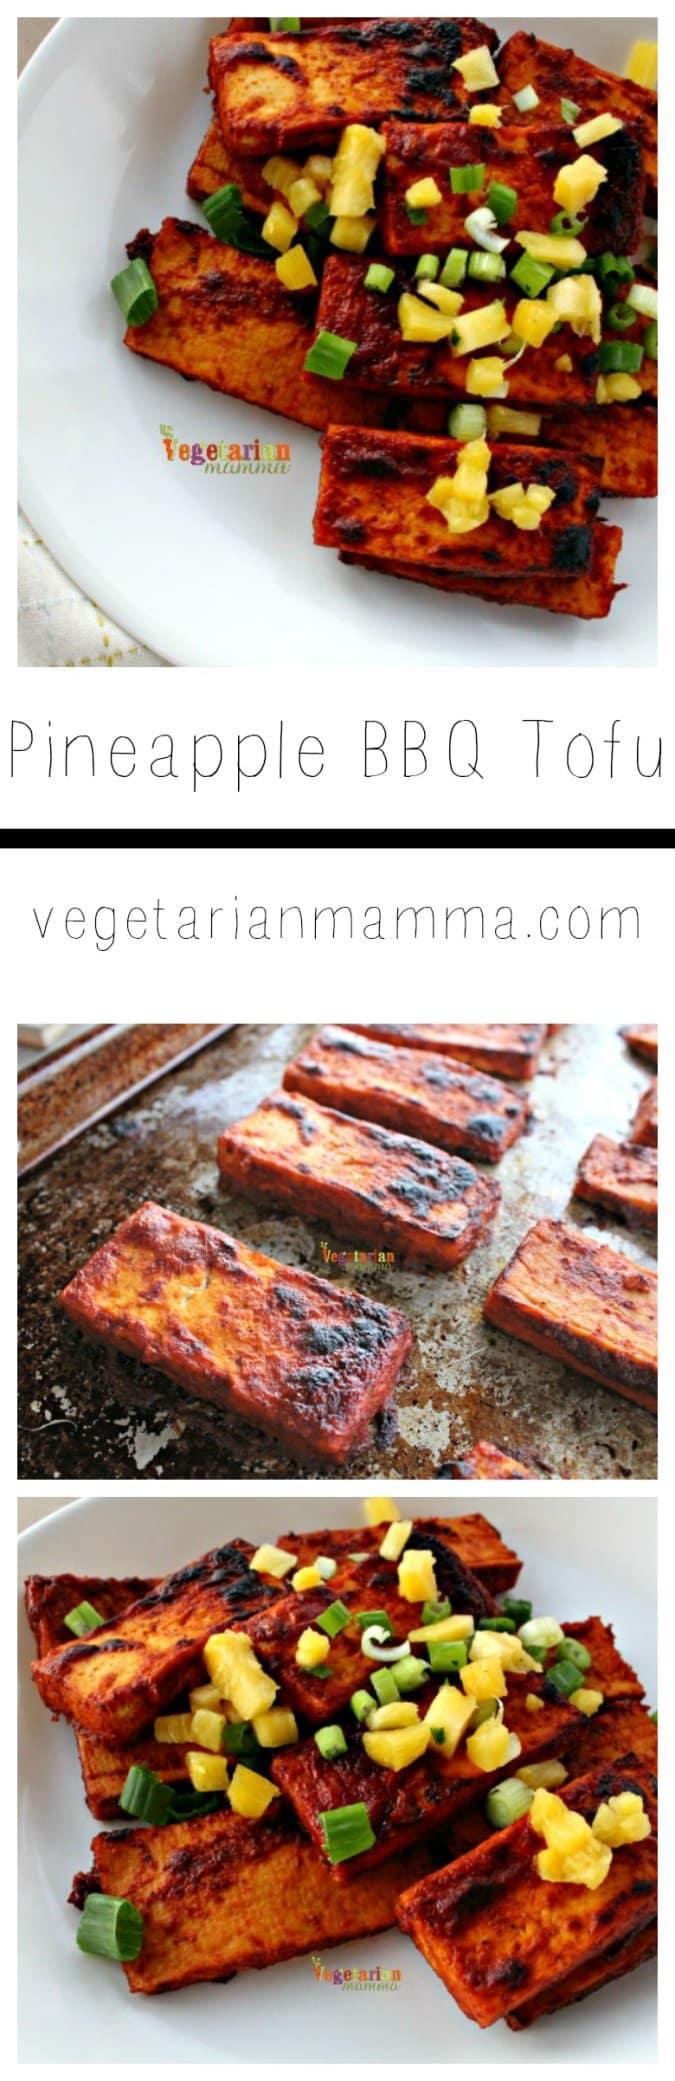 Pineapple BBQ Tofu @vegetarianmamma.com #tofu #pineapple #broil #vegetarian #BBQ